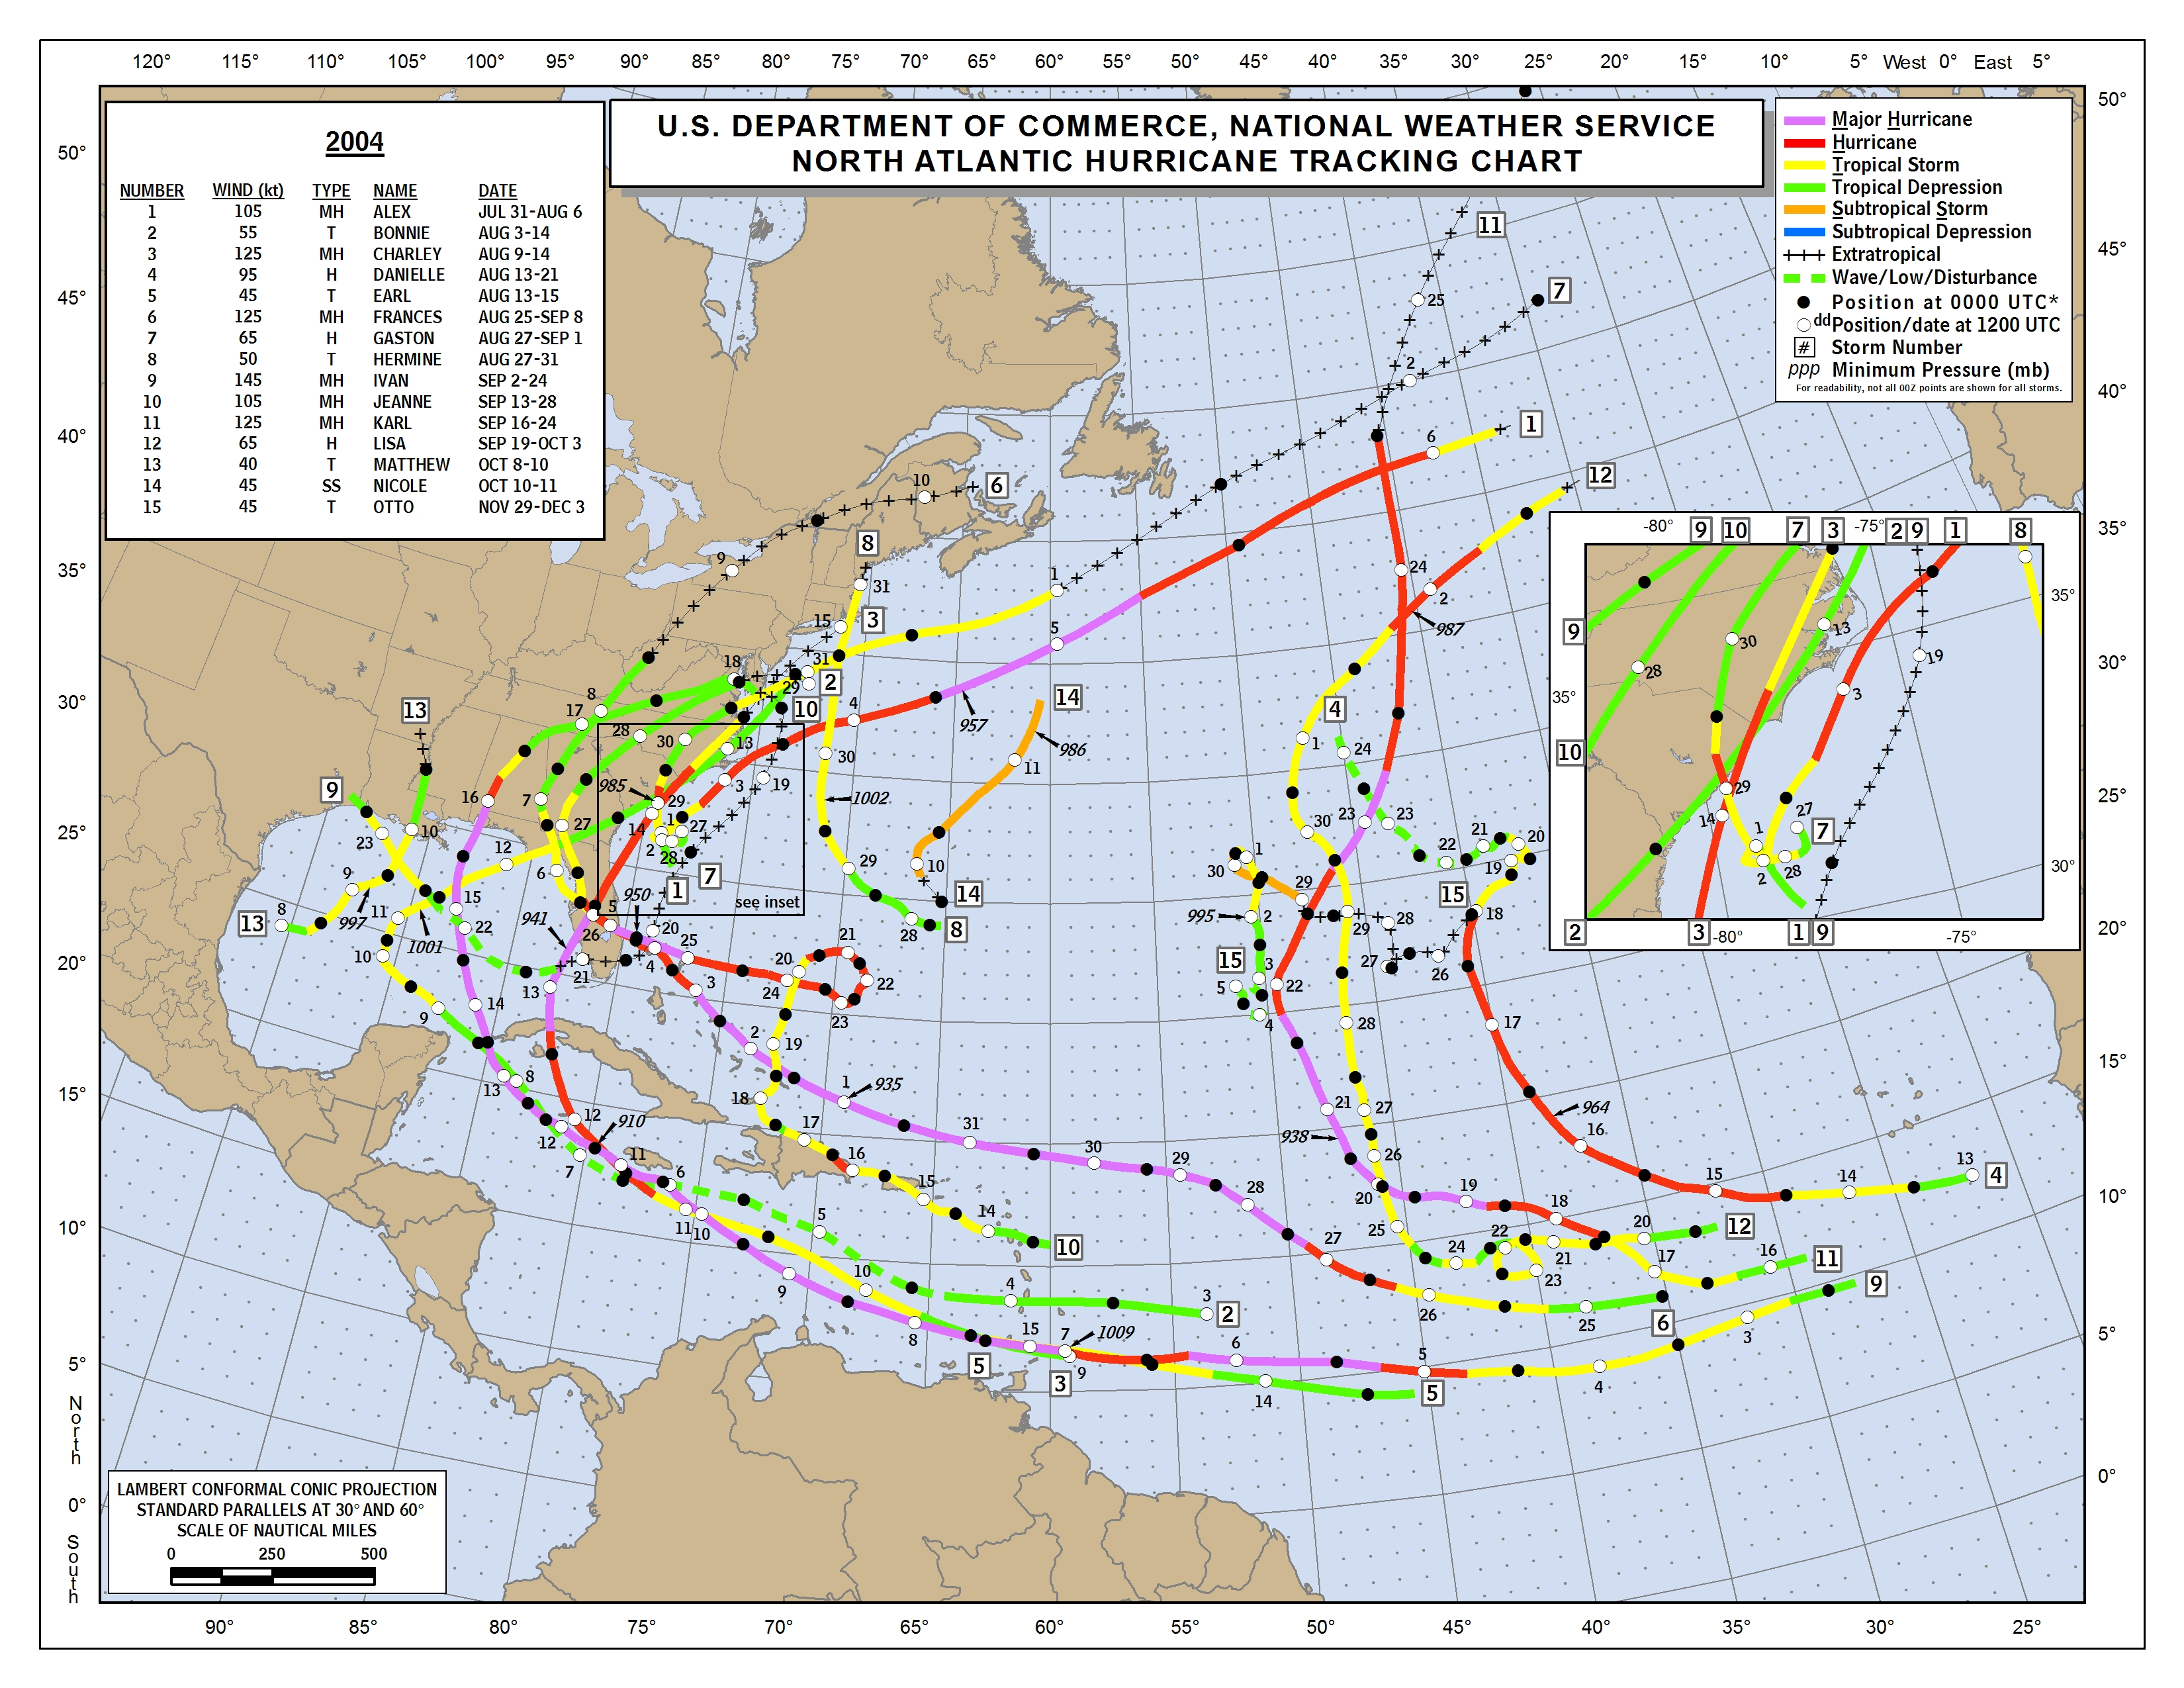 Florida Radar Weather Map.Weathercarib Tropical Atlantic Caribbean Weather Fast Links To